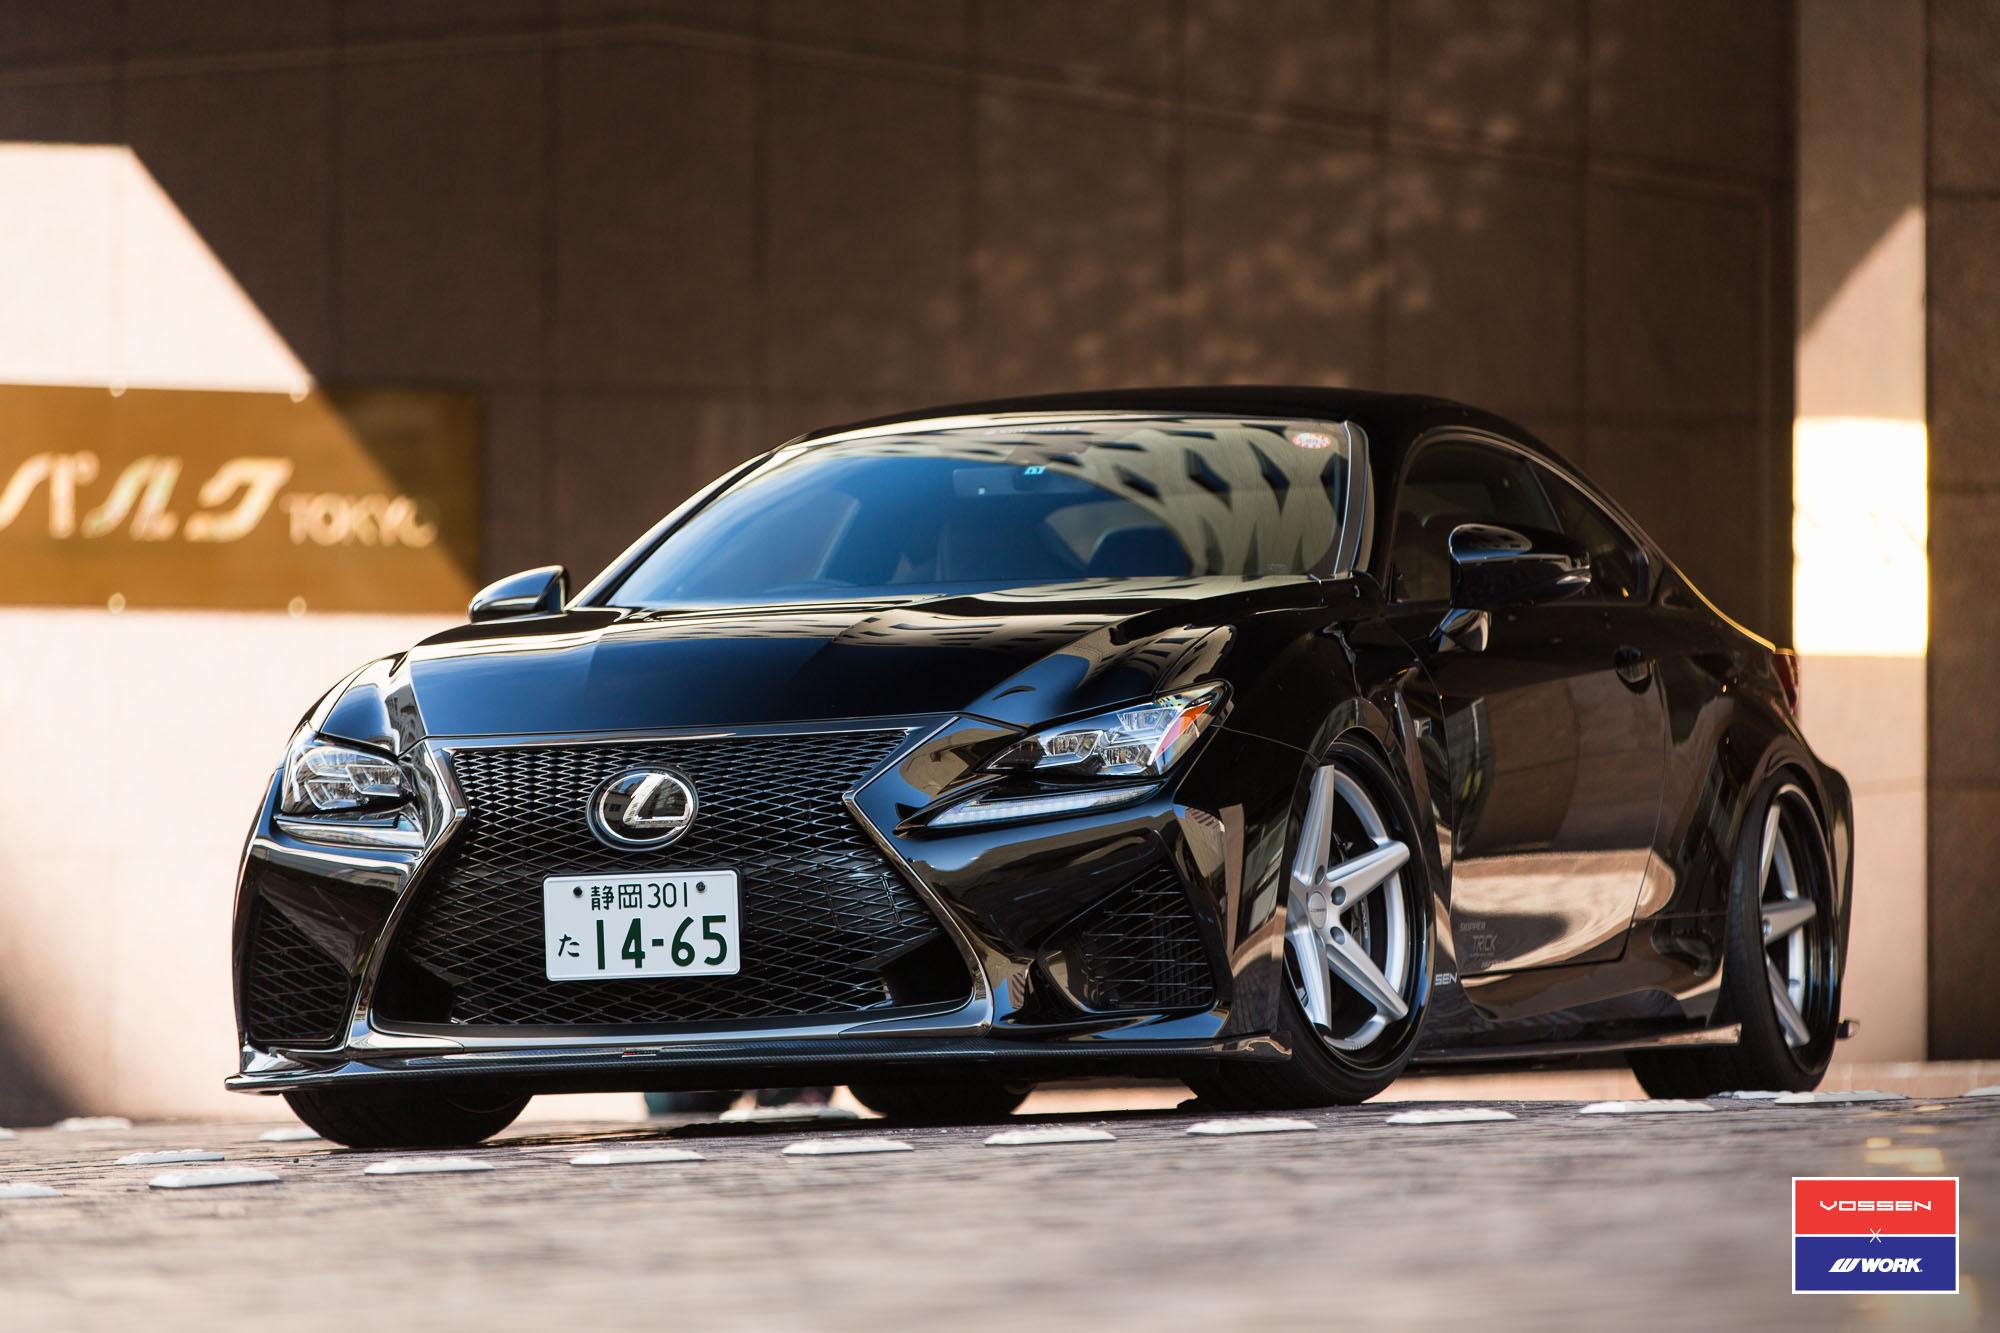 Lexus RC F by Skipper Japan Has Vossen Wheels - autoevolution